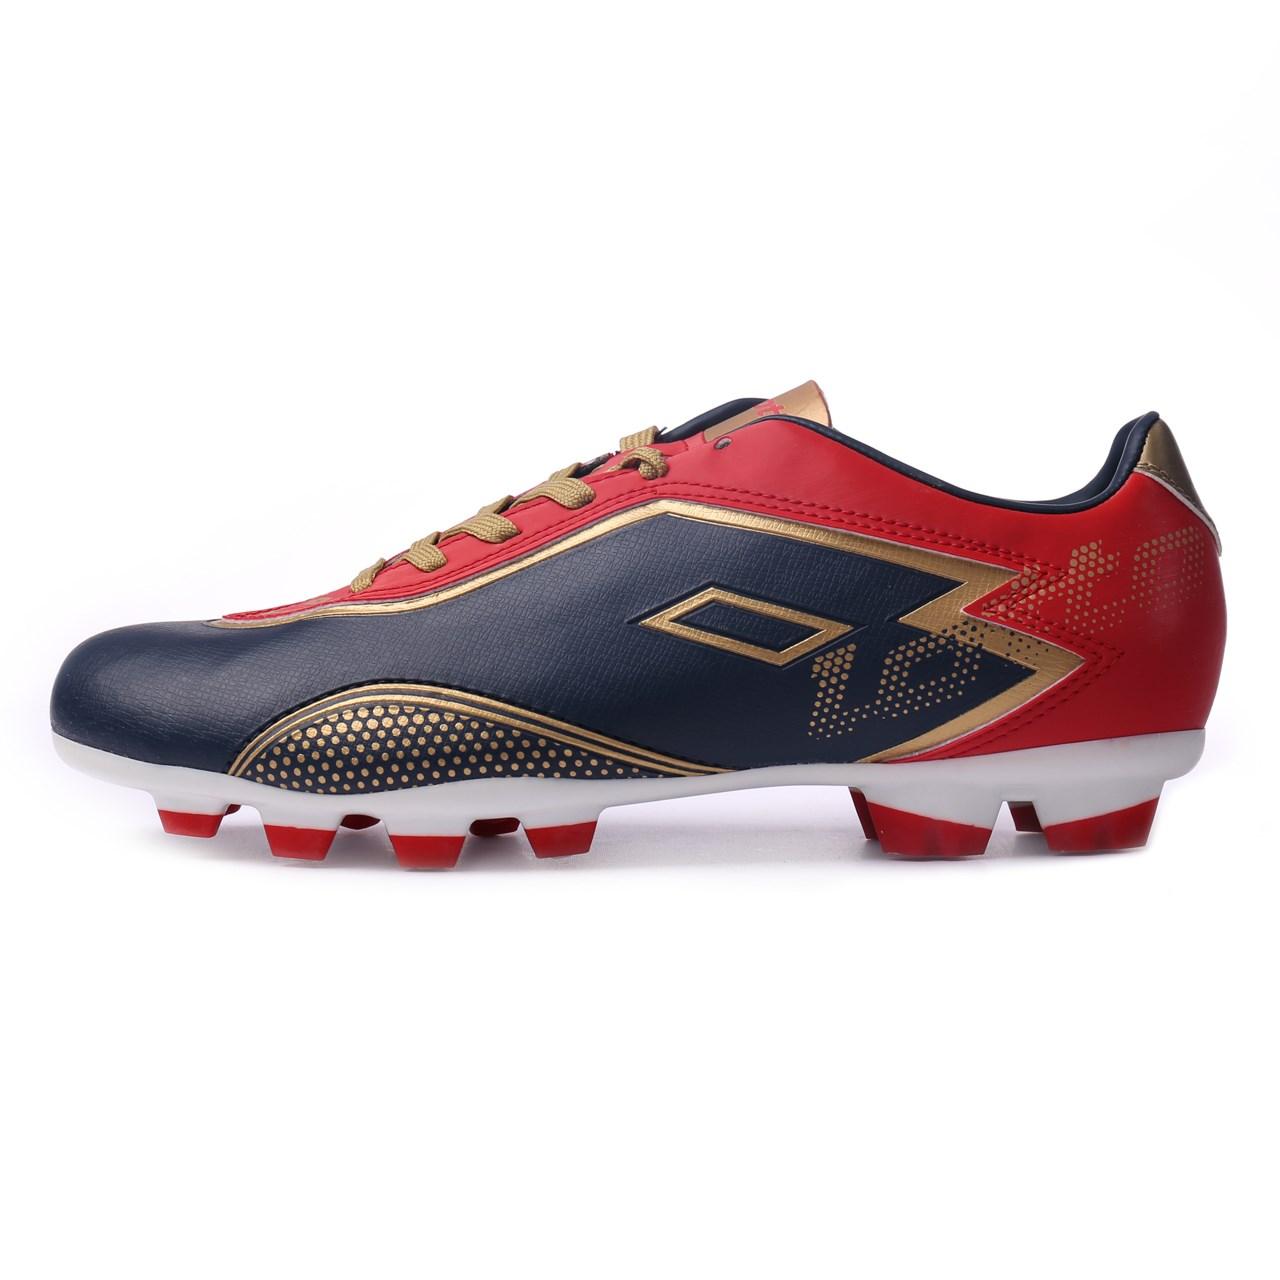 قیمت کفش فوتبال مردانه لوتو مدل ZHERO GRAV.IV700